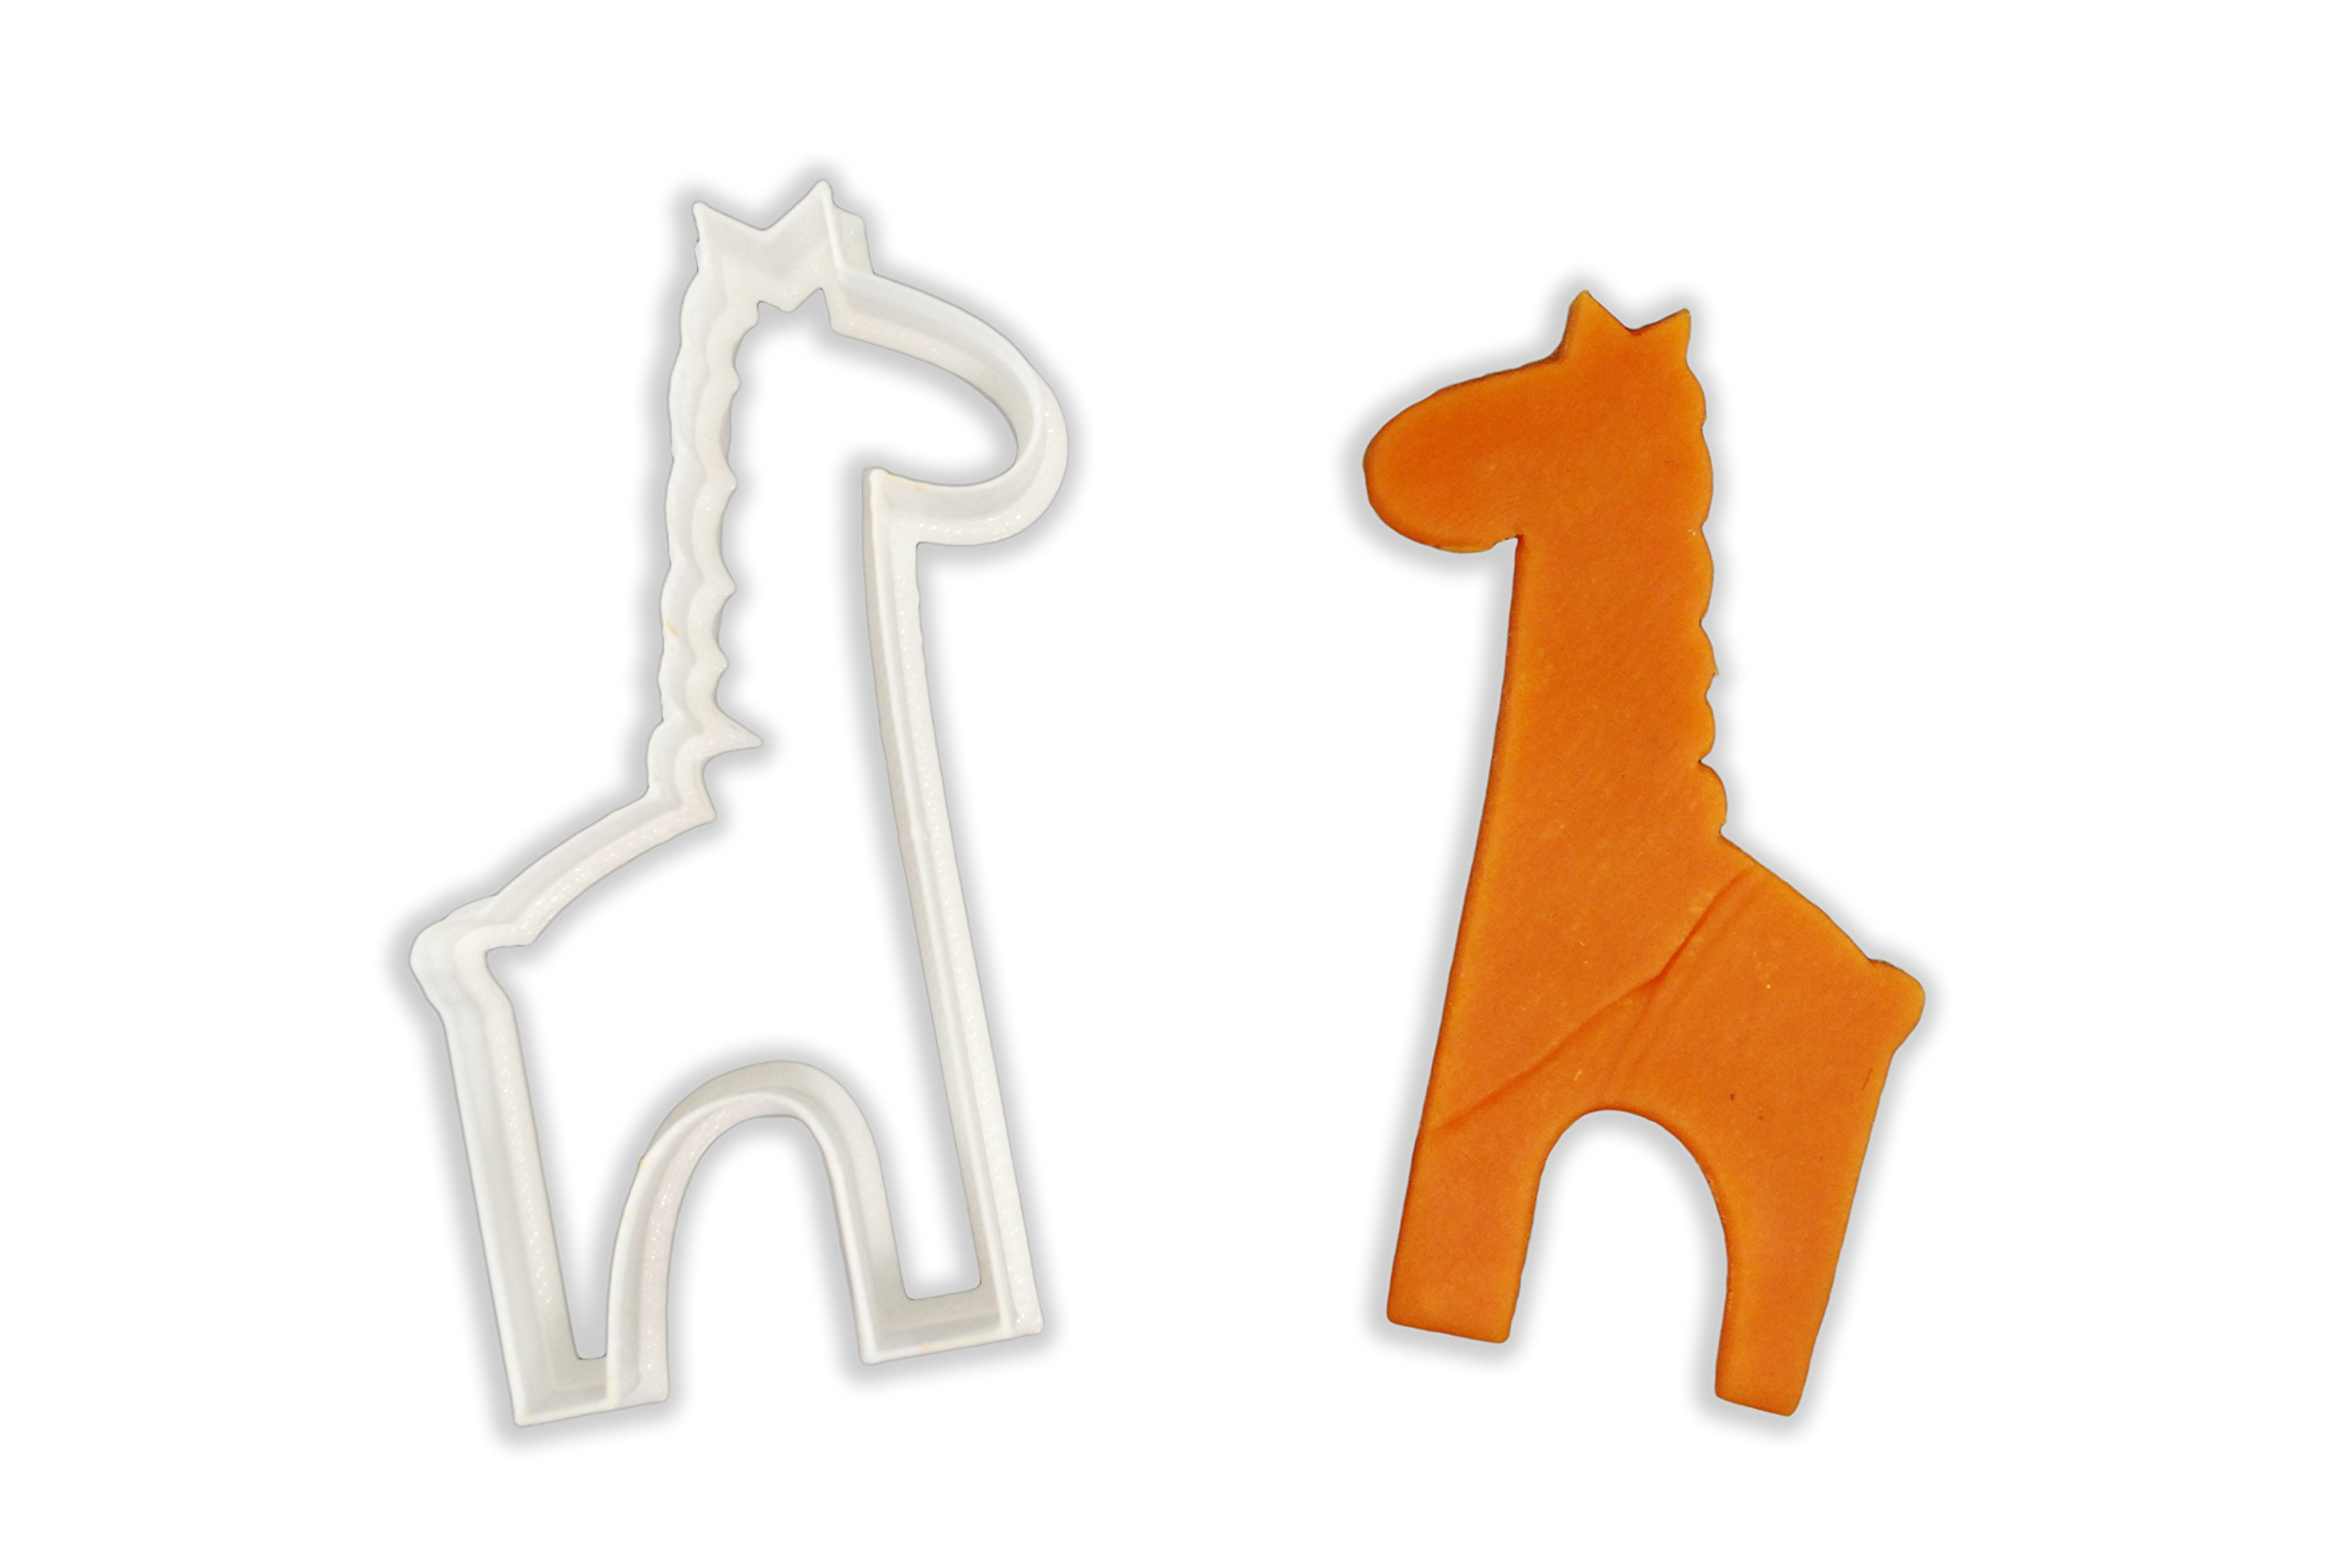 Cute Giraffe Animal Cookie Cutter - LARGE - 4 Inches